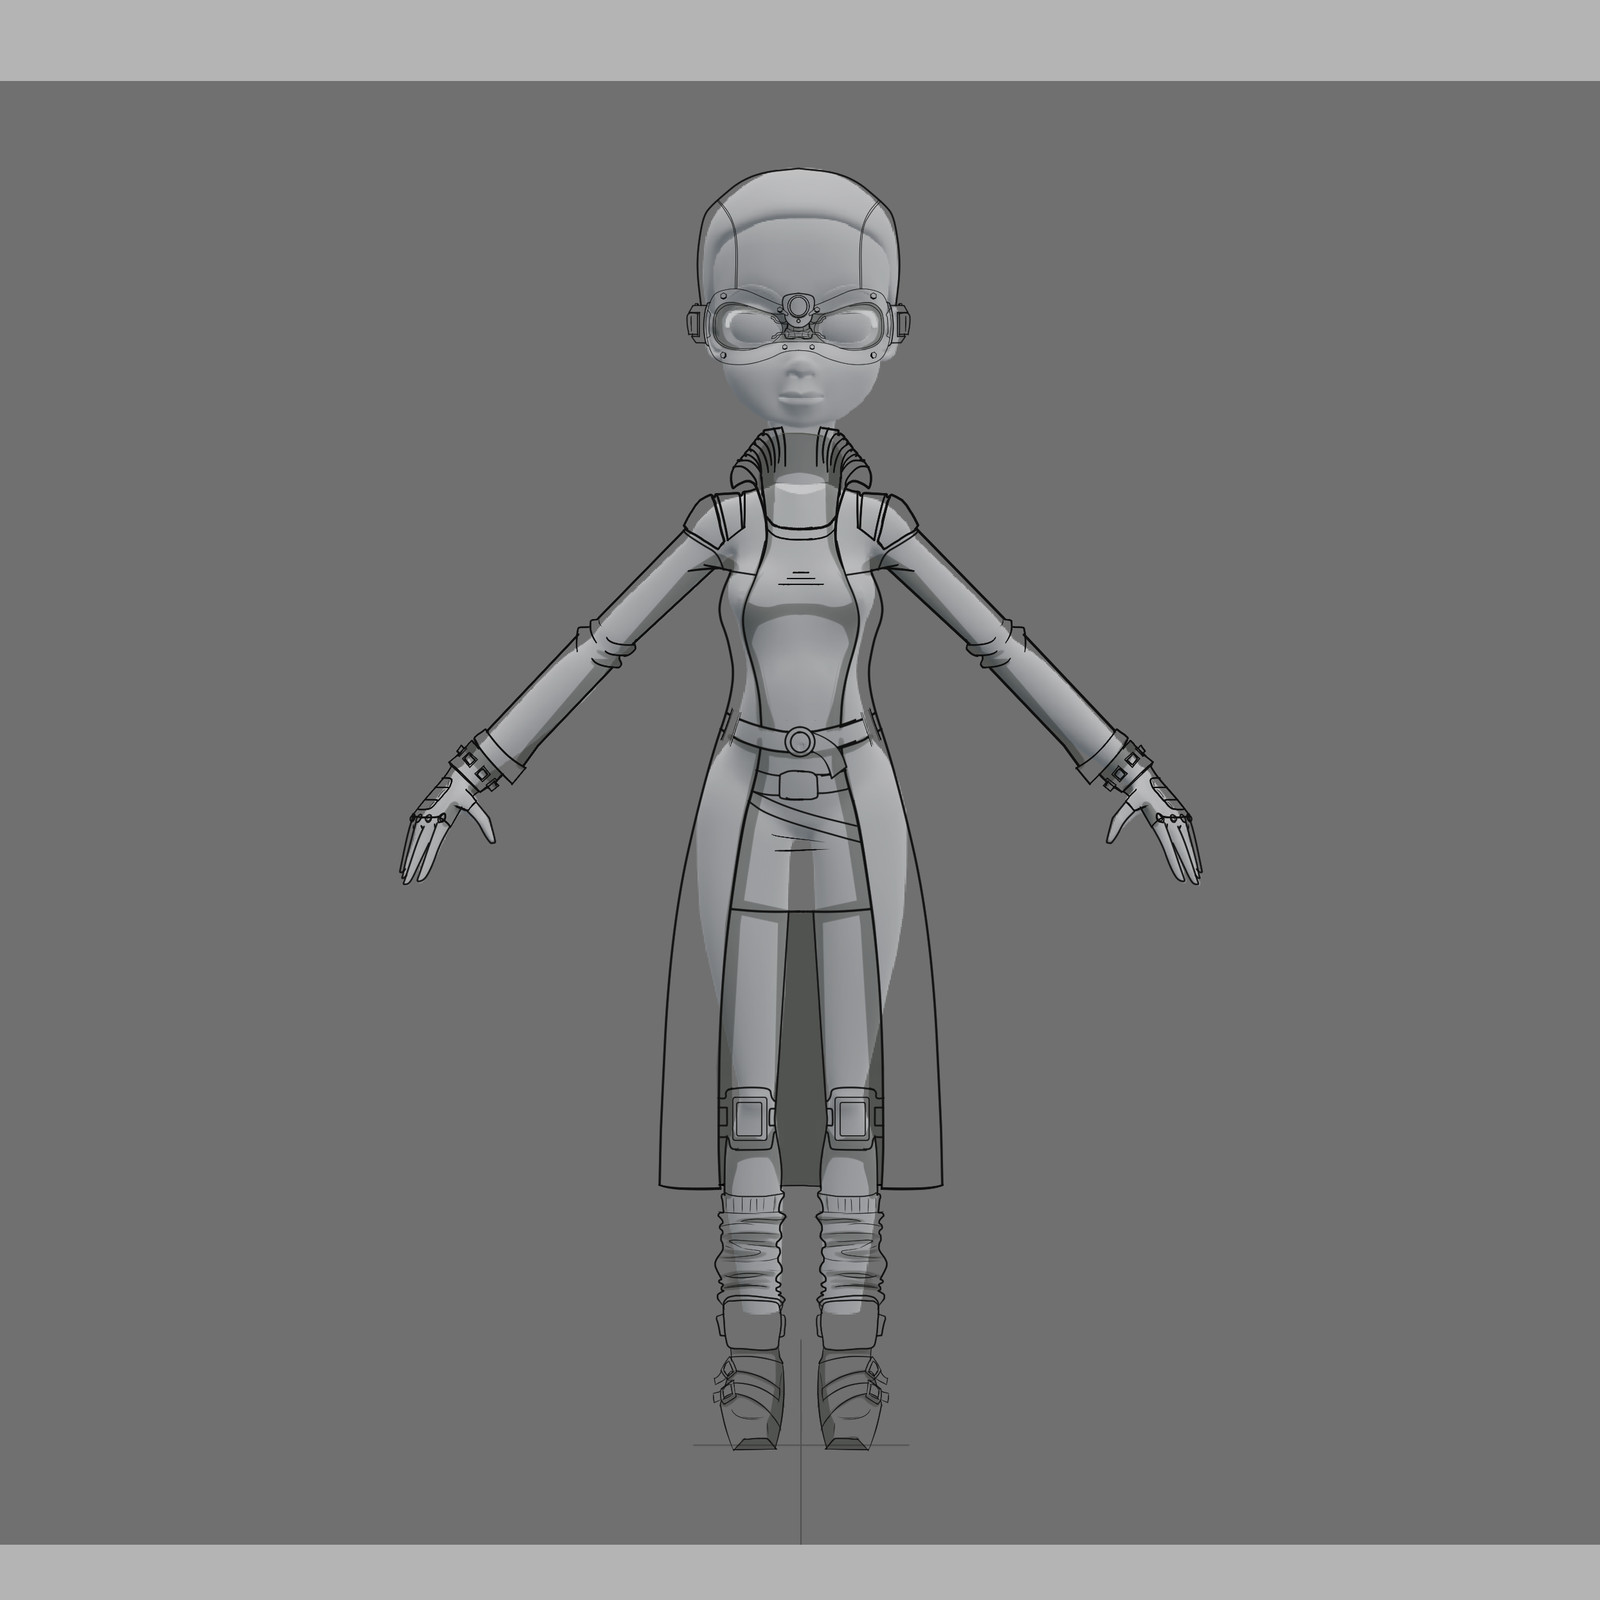 Base sculpt of the protagonist, Jane.